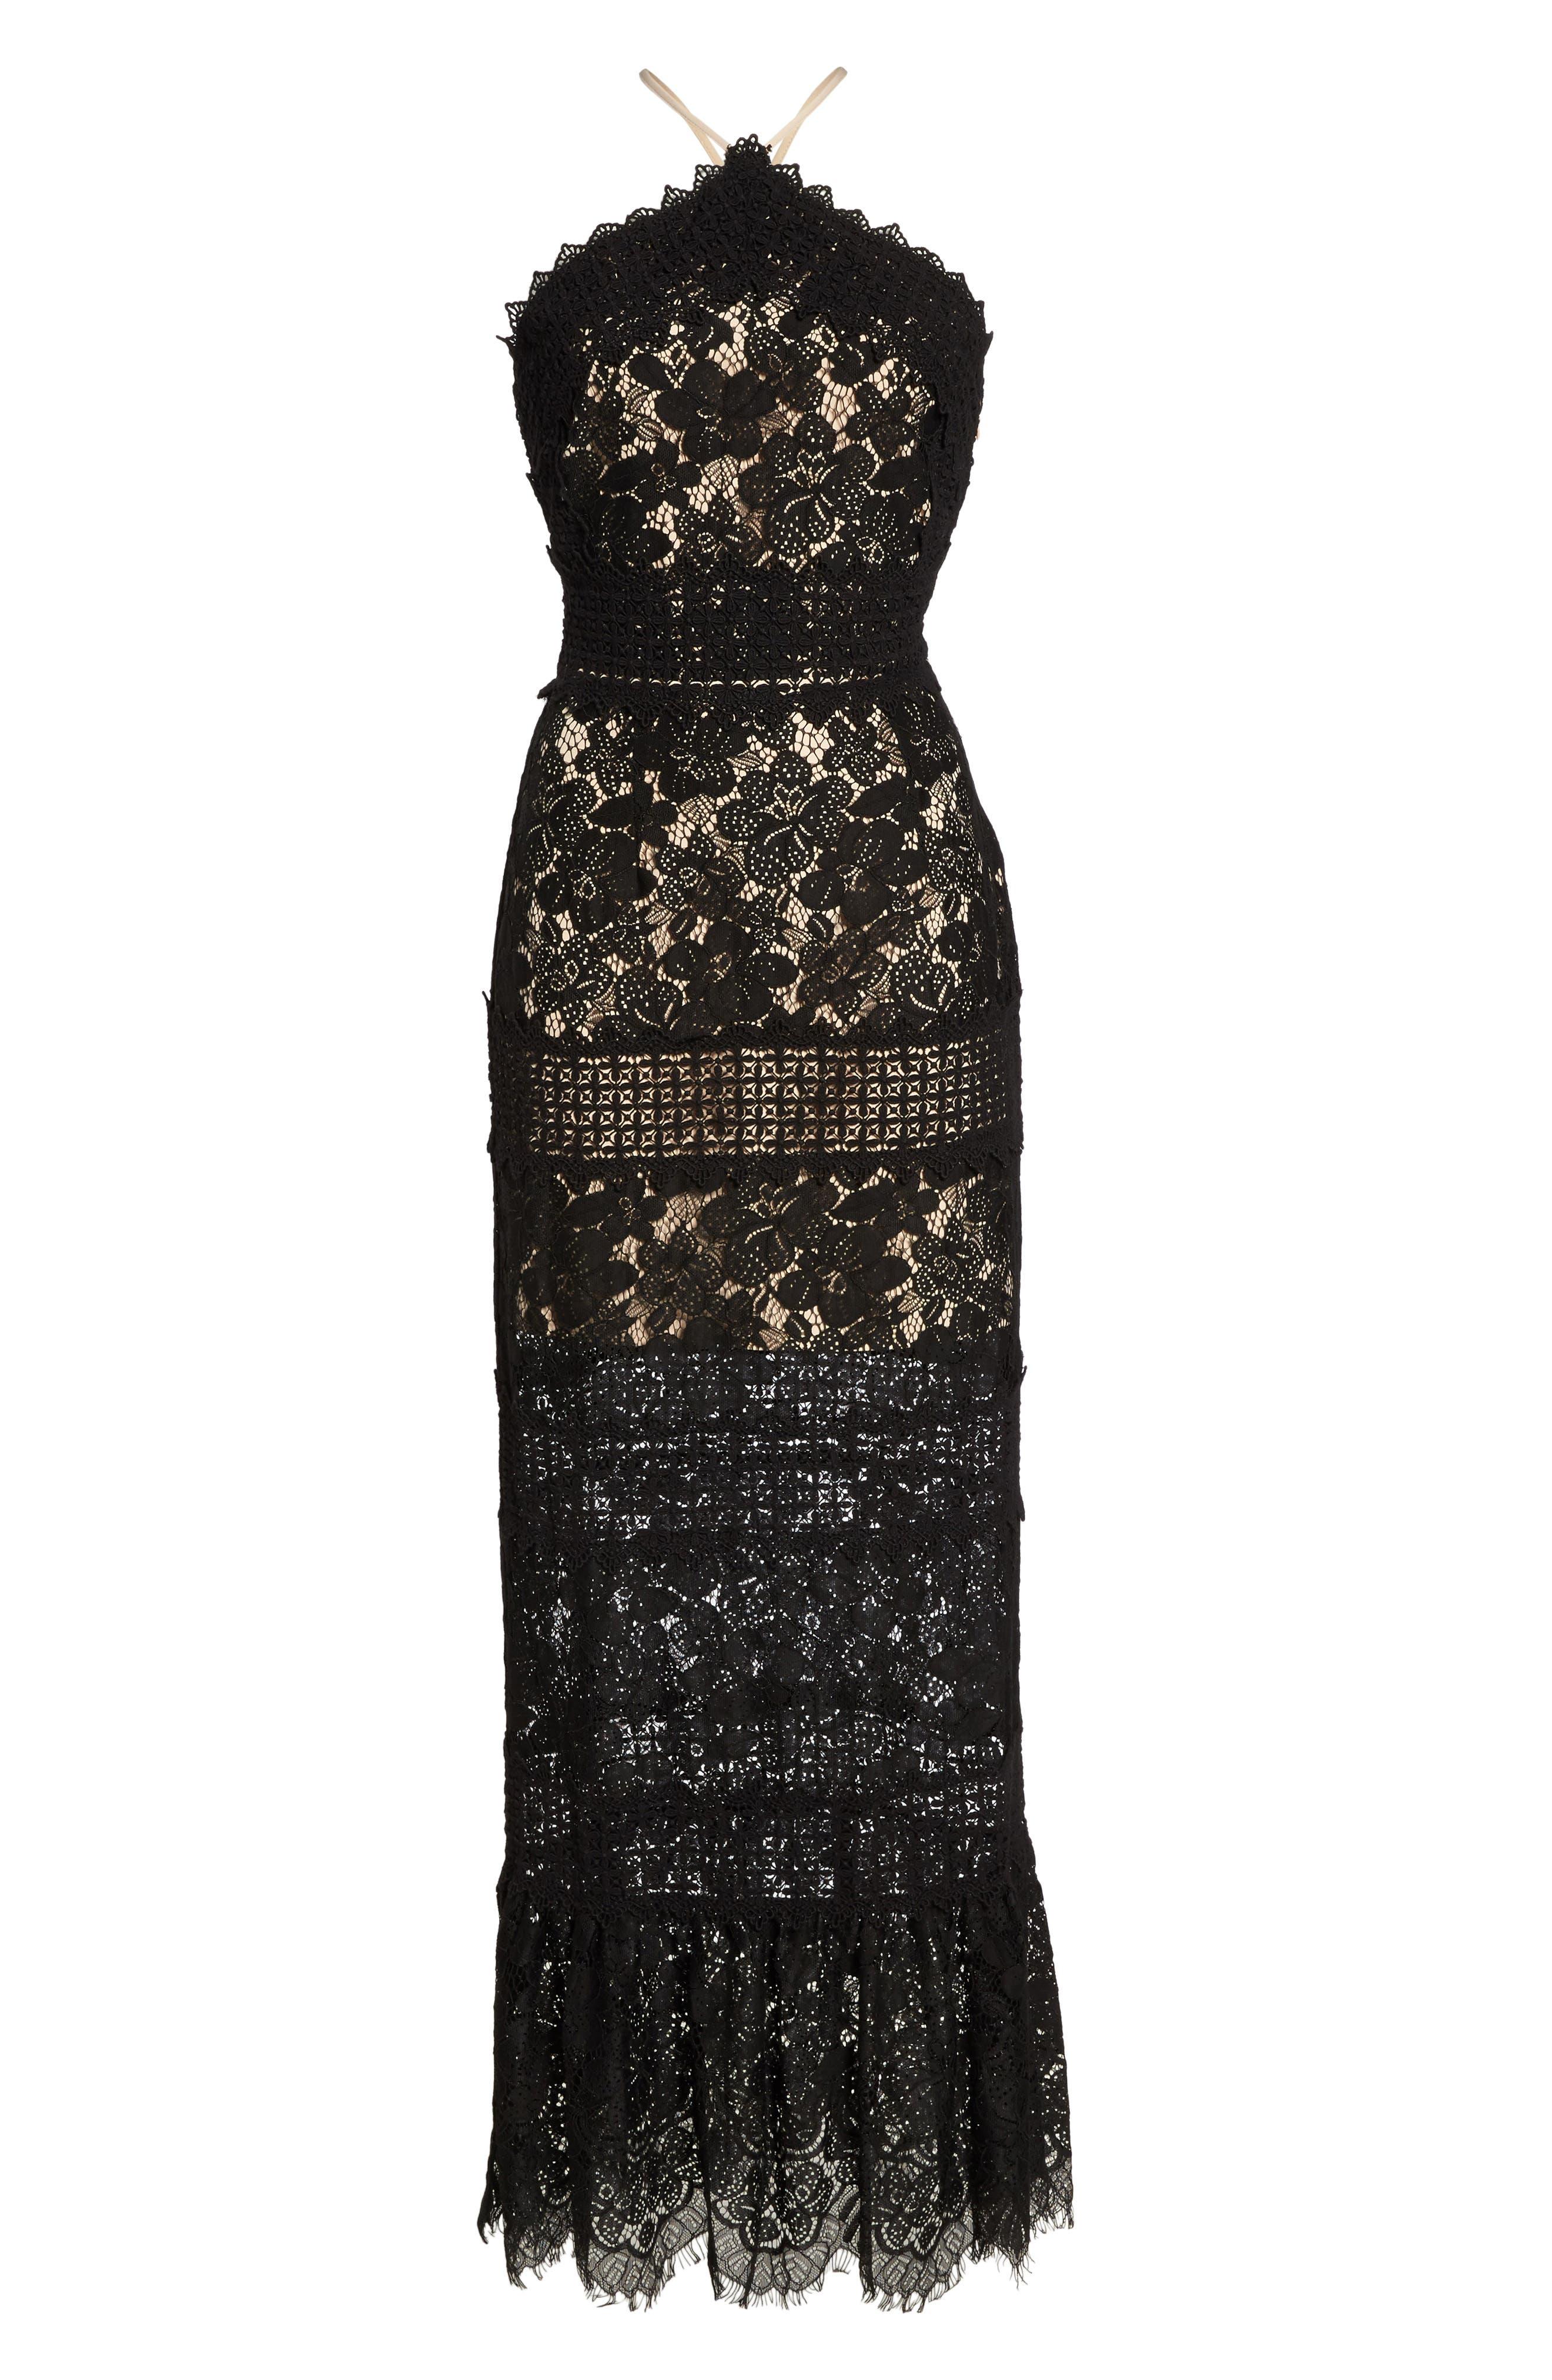 Tabitha Lace Maxi Dress,                             Alternate thumbnail 6, color,                             001